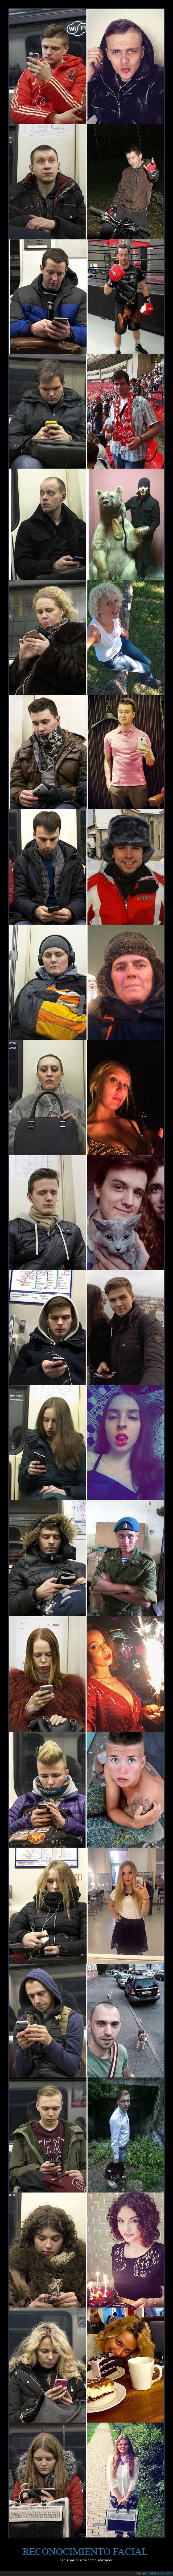 egor tsevtkov,facial,fotógrafo,reconocer,ruso